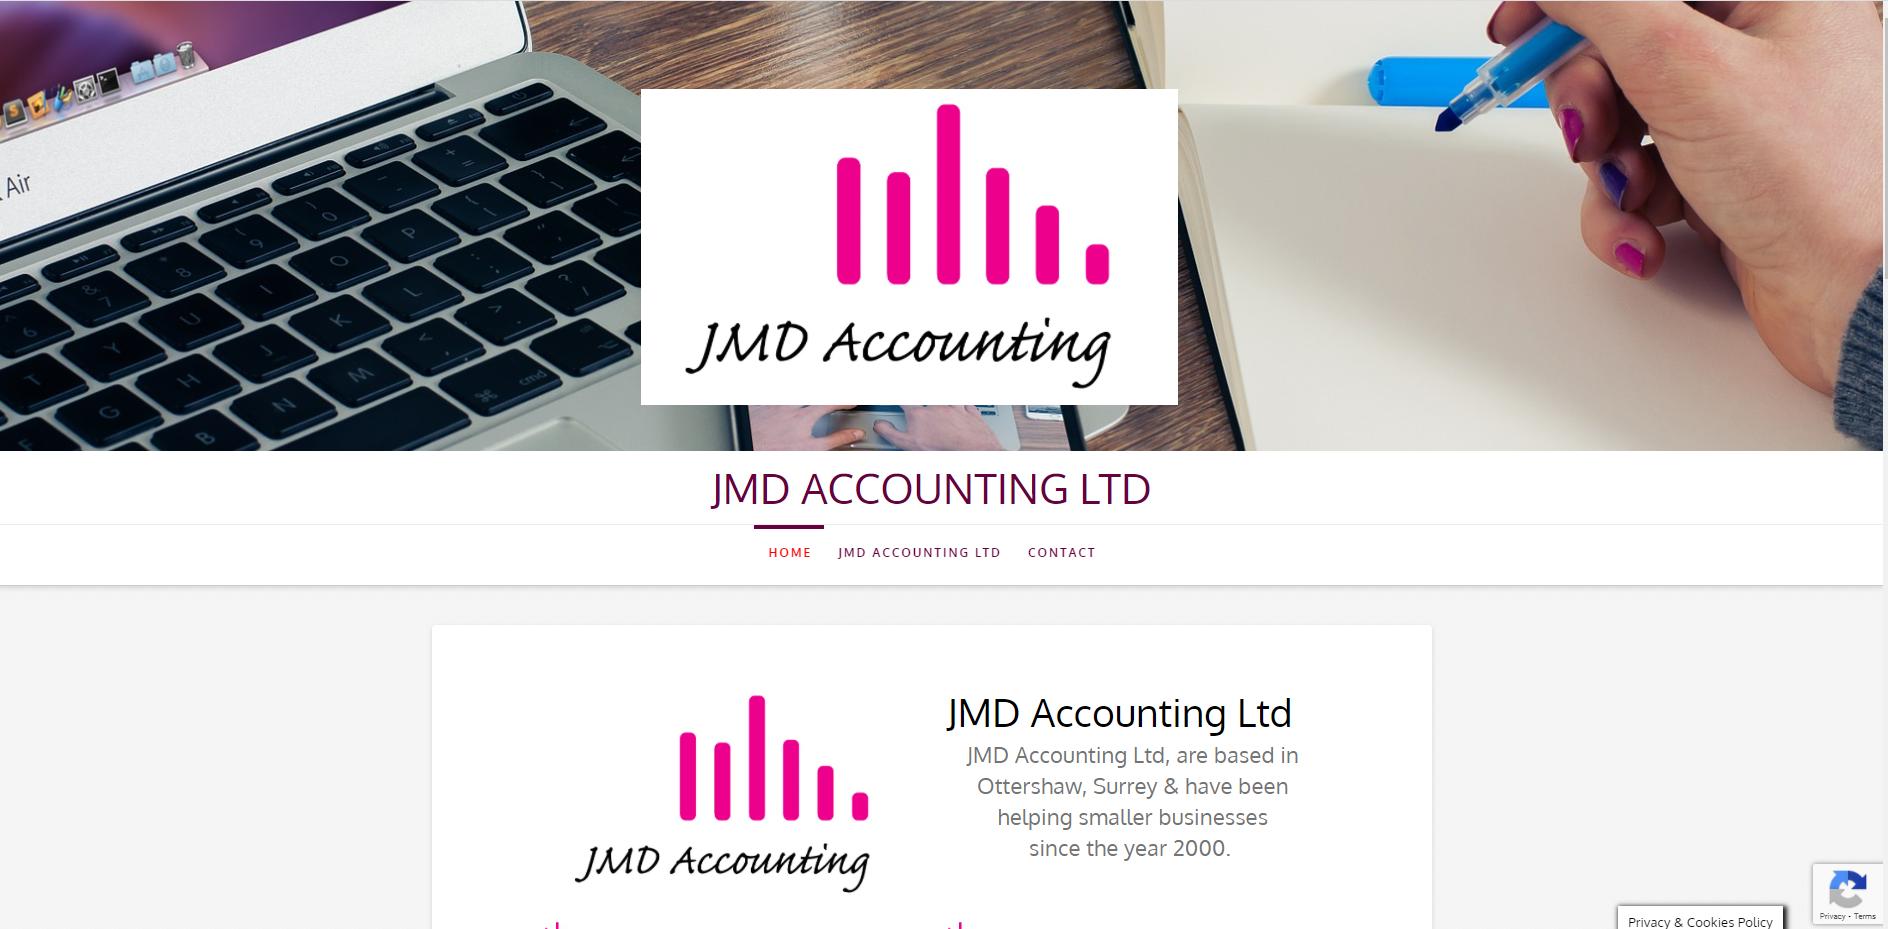 JMD Accounting website By T900 Website Design in Surrey